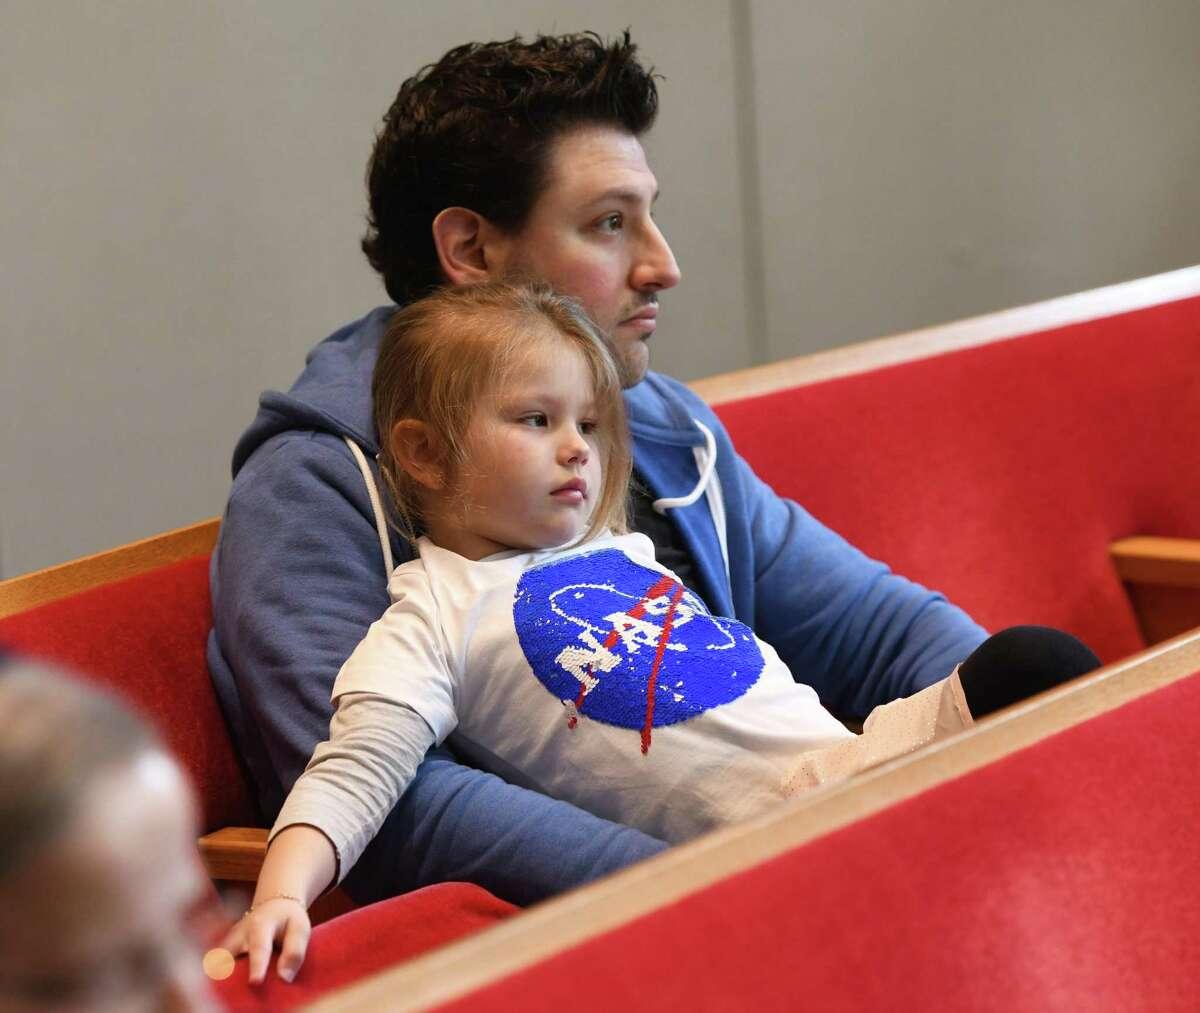 Greenwich's Marlowe Harris, 4, wears a NASA shirt beside her father, Seth Harris, while attending astronaut Dr. Jeffrey Hoffman's presentation